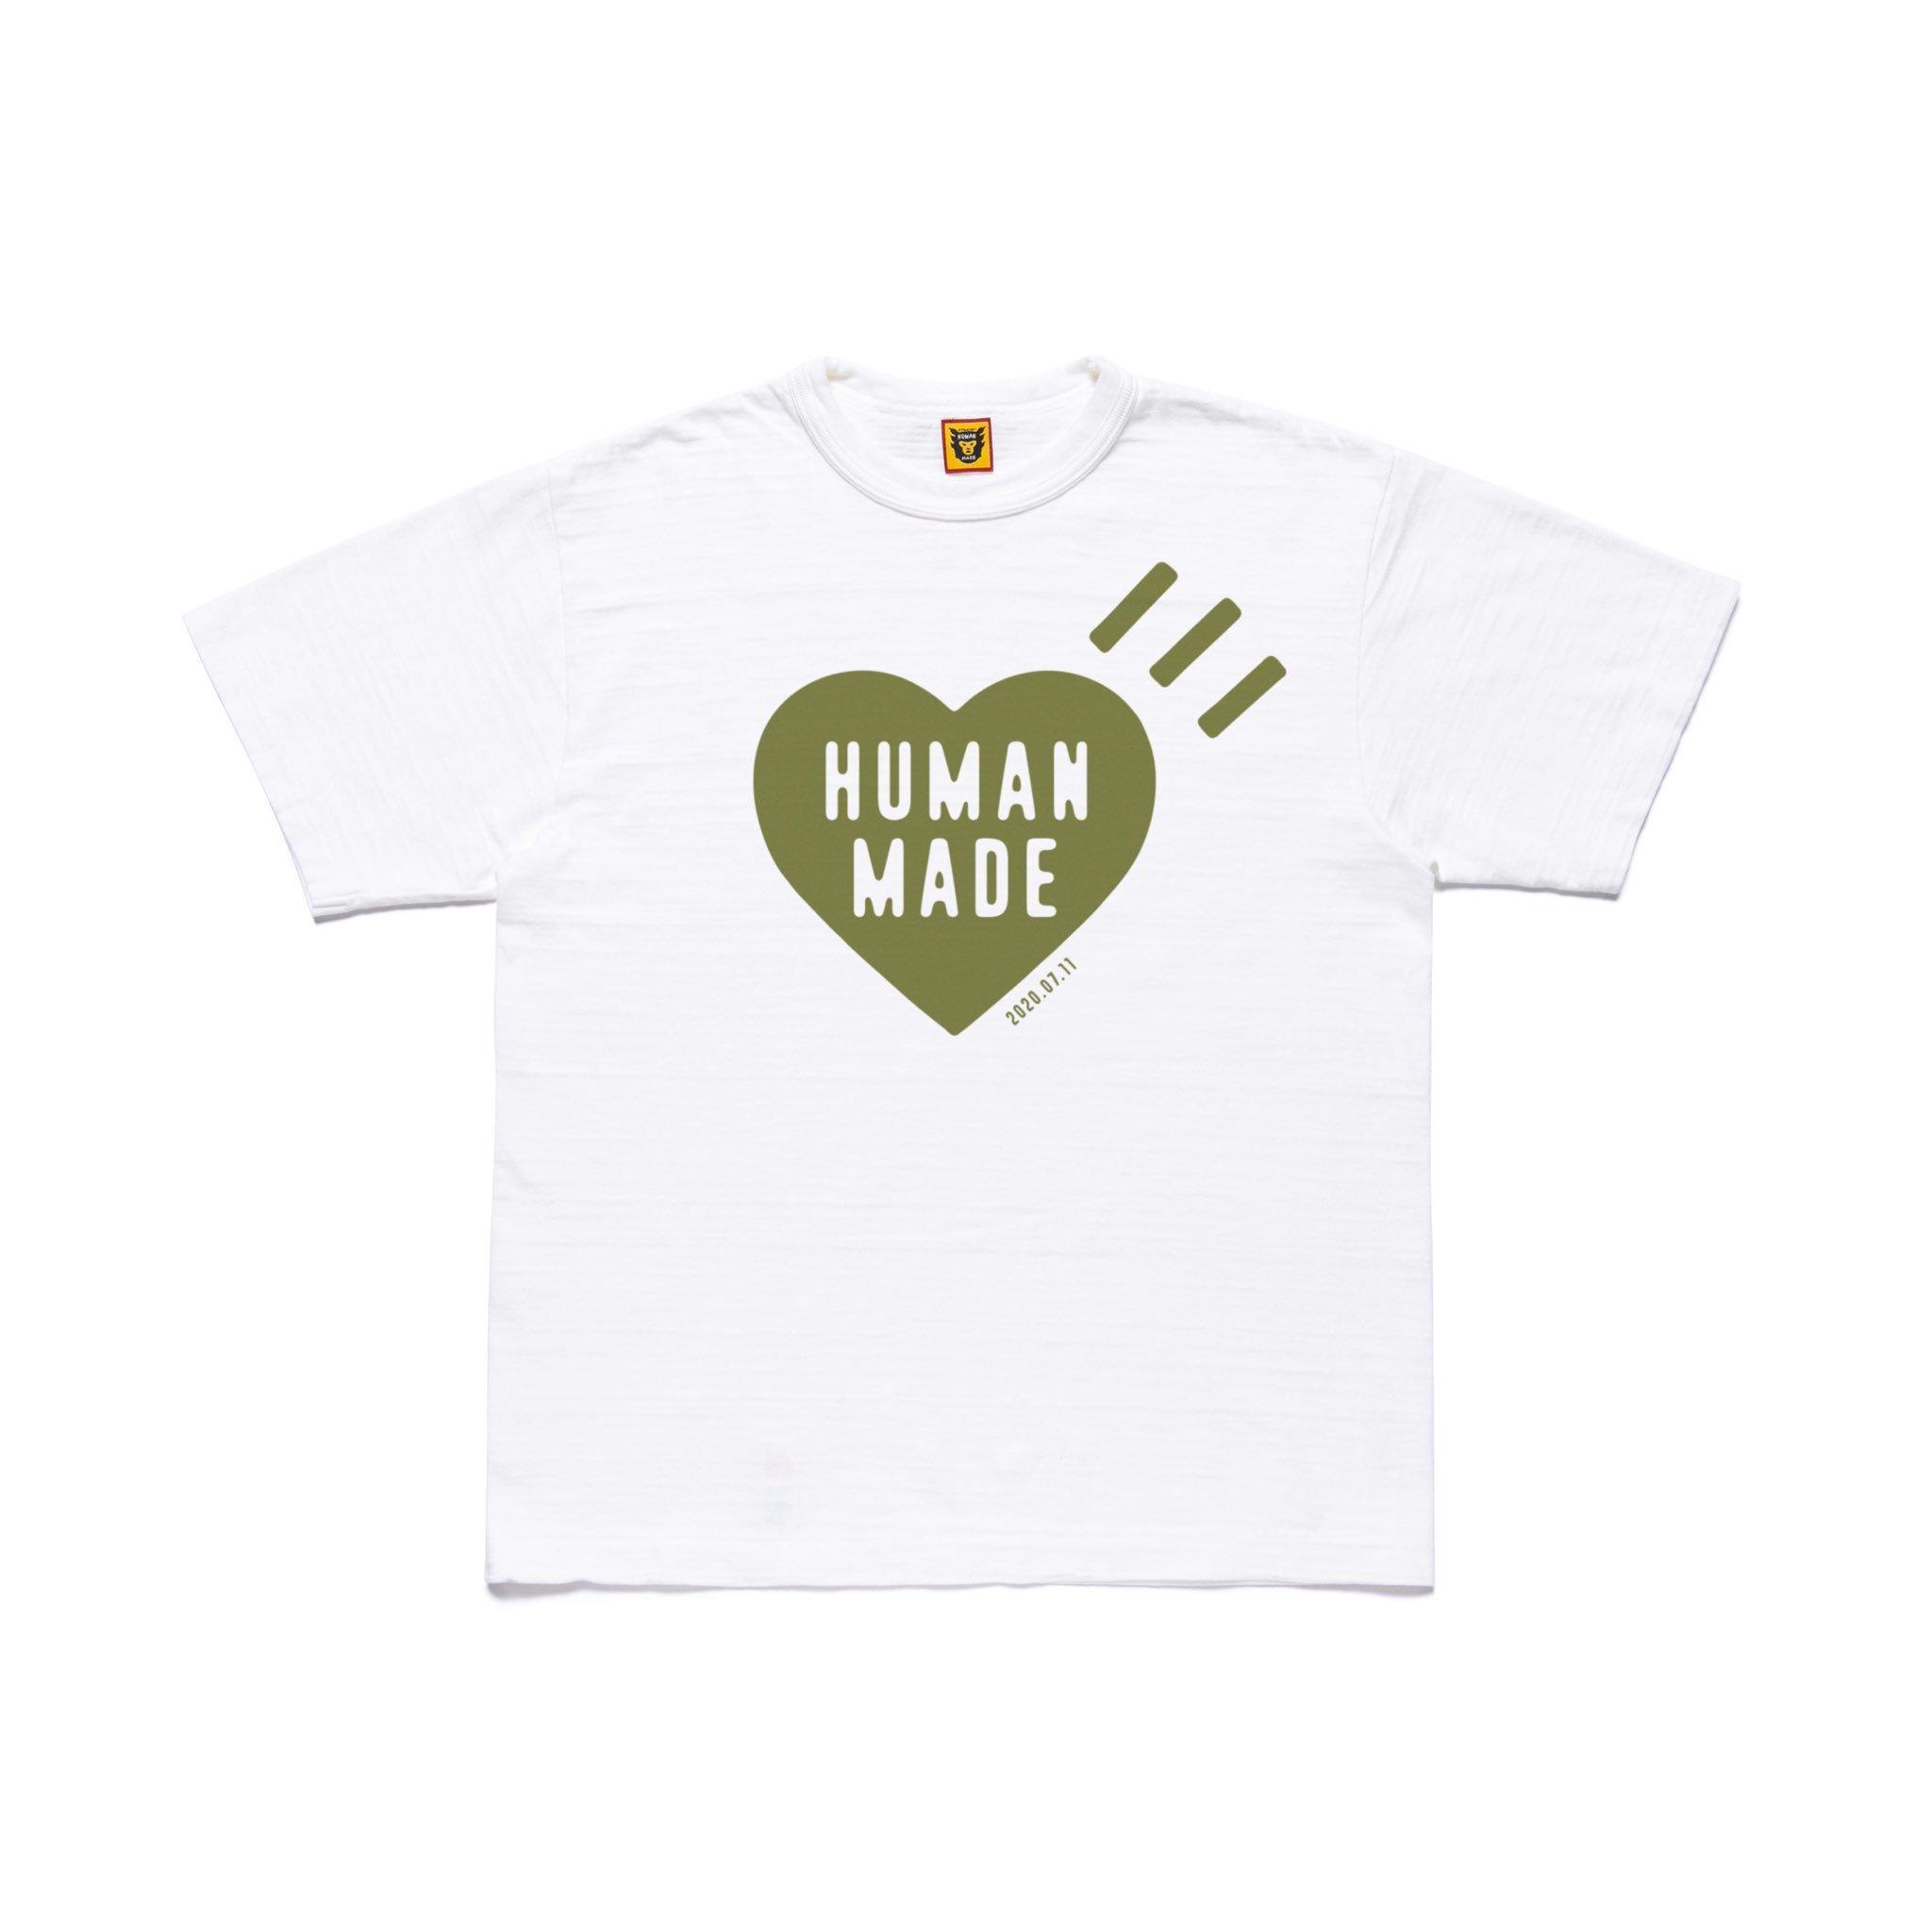 【MF SHOP】HUMAN MADE #20711 TEE 短袖T恤